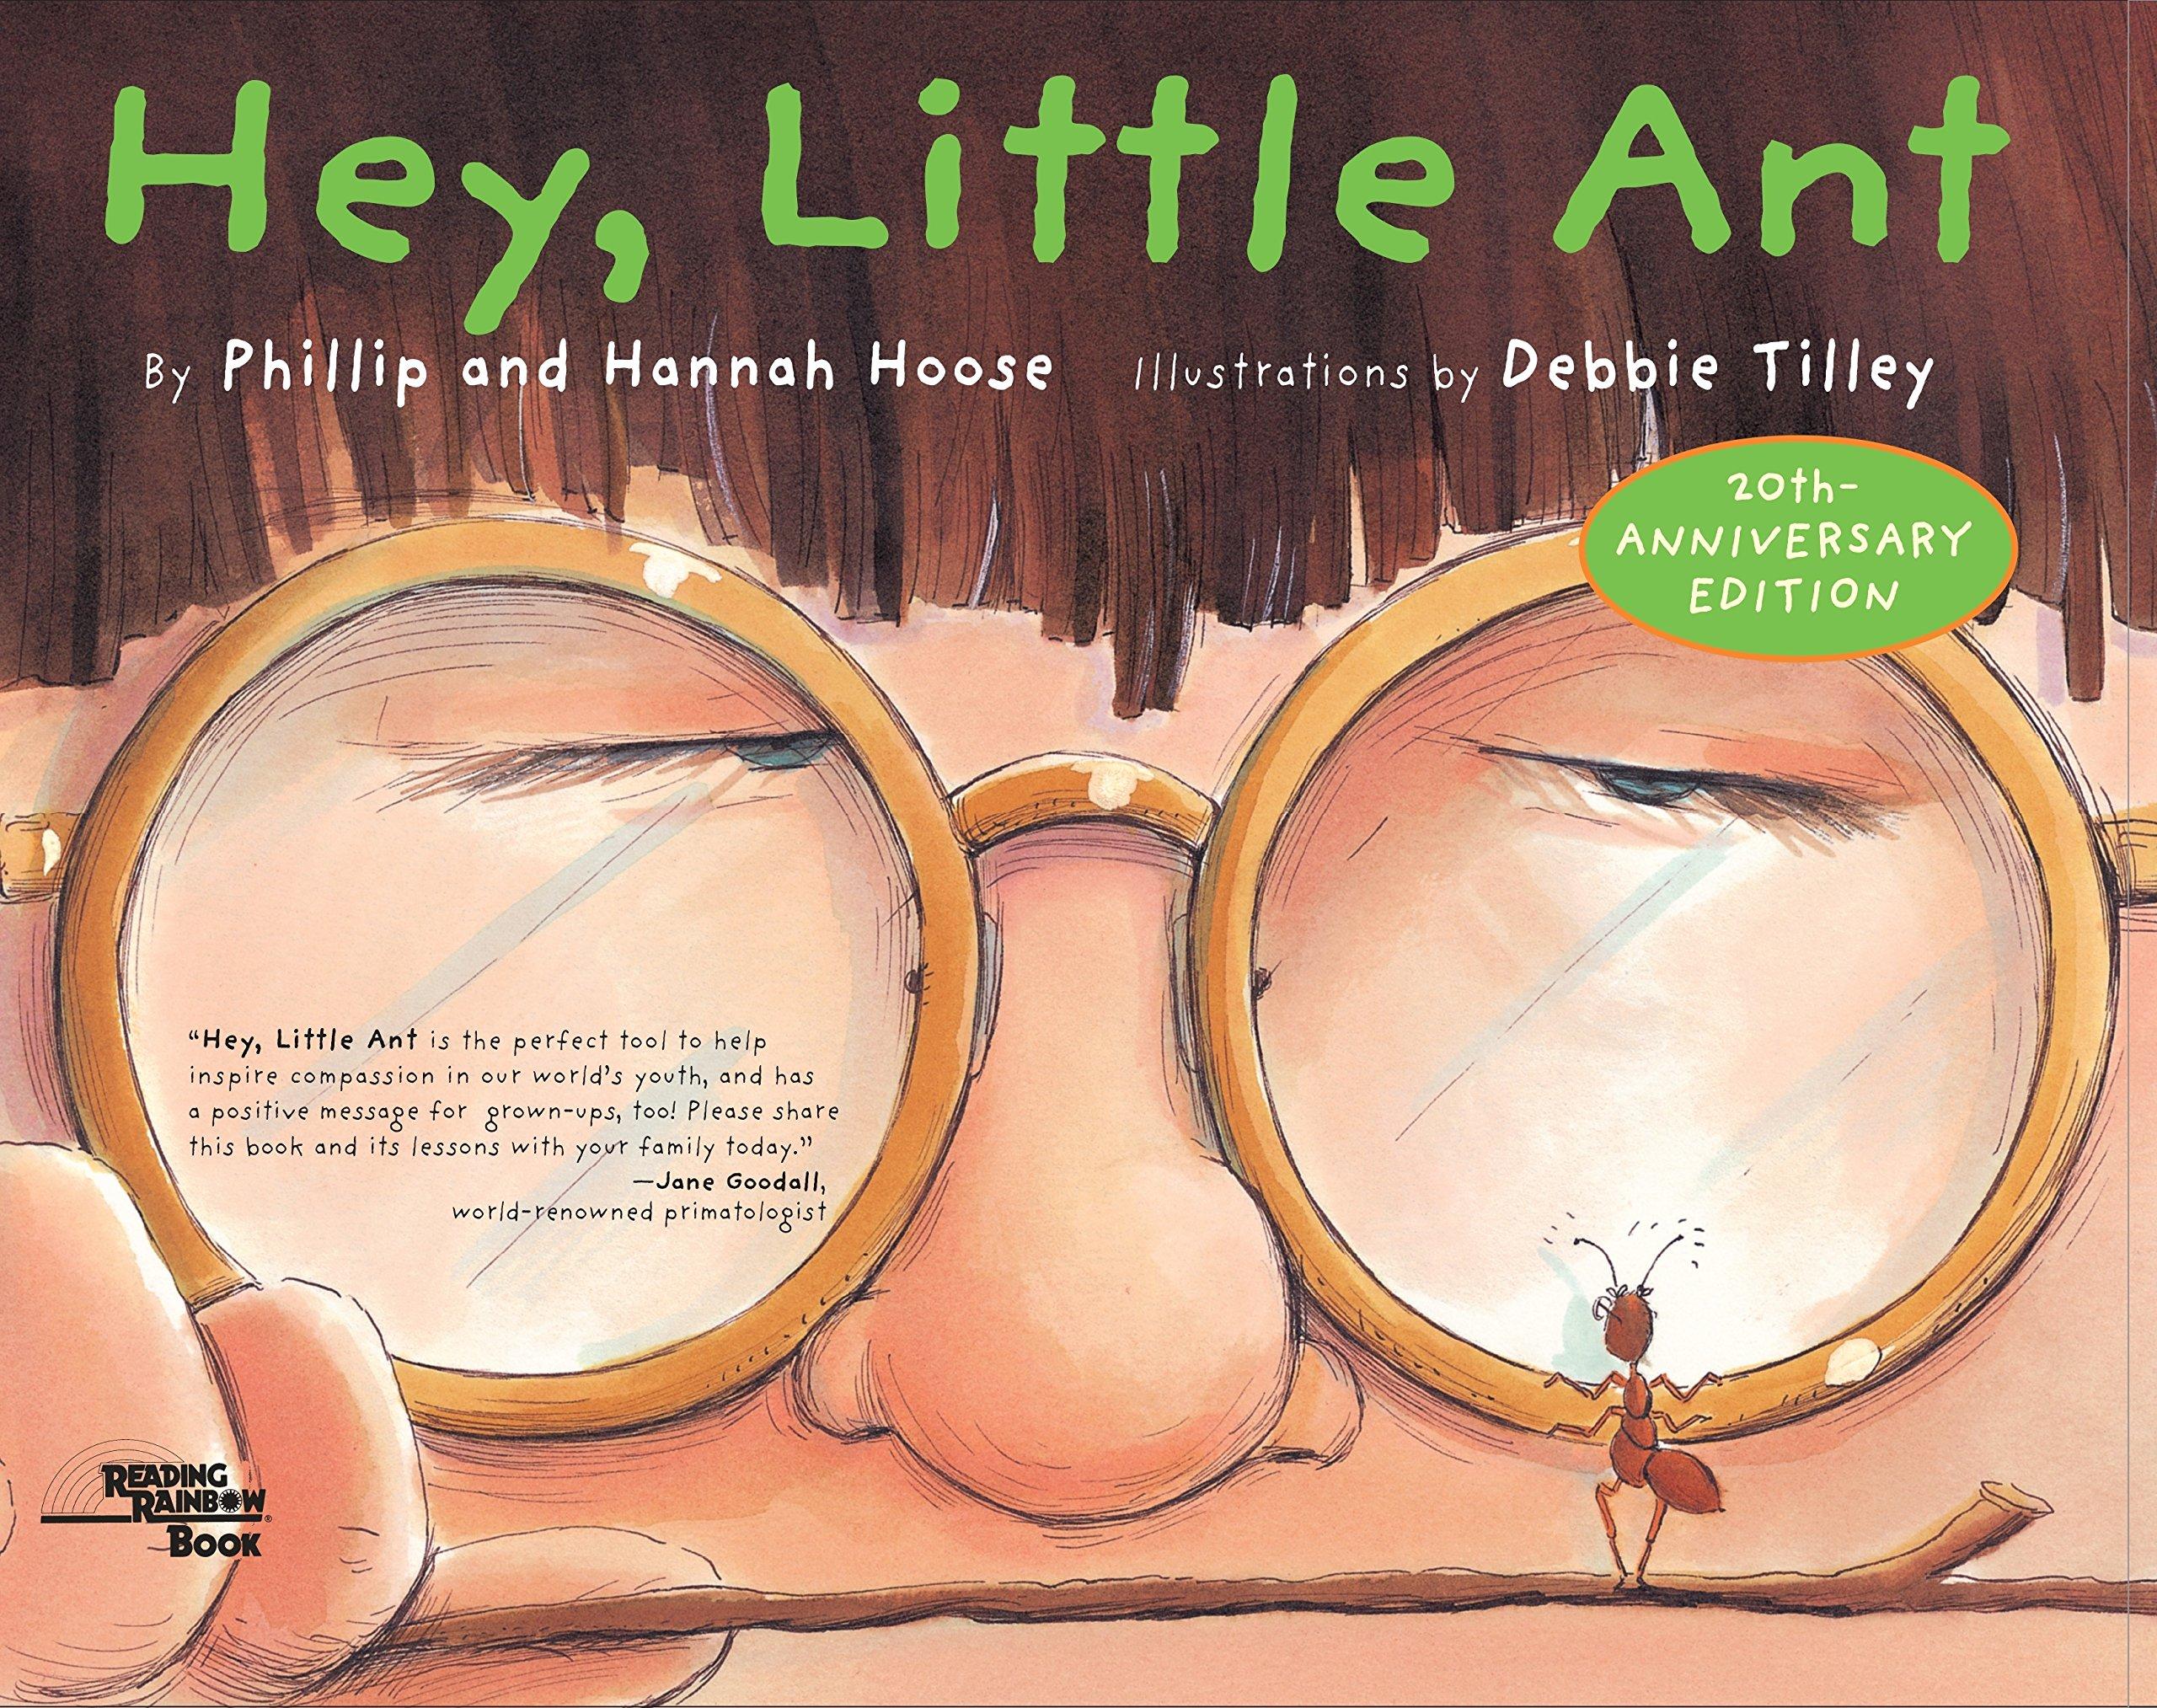 Hey, Little Ant: Phillip M. Hoose, Hannah Hoose, Debbie Tilley ...